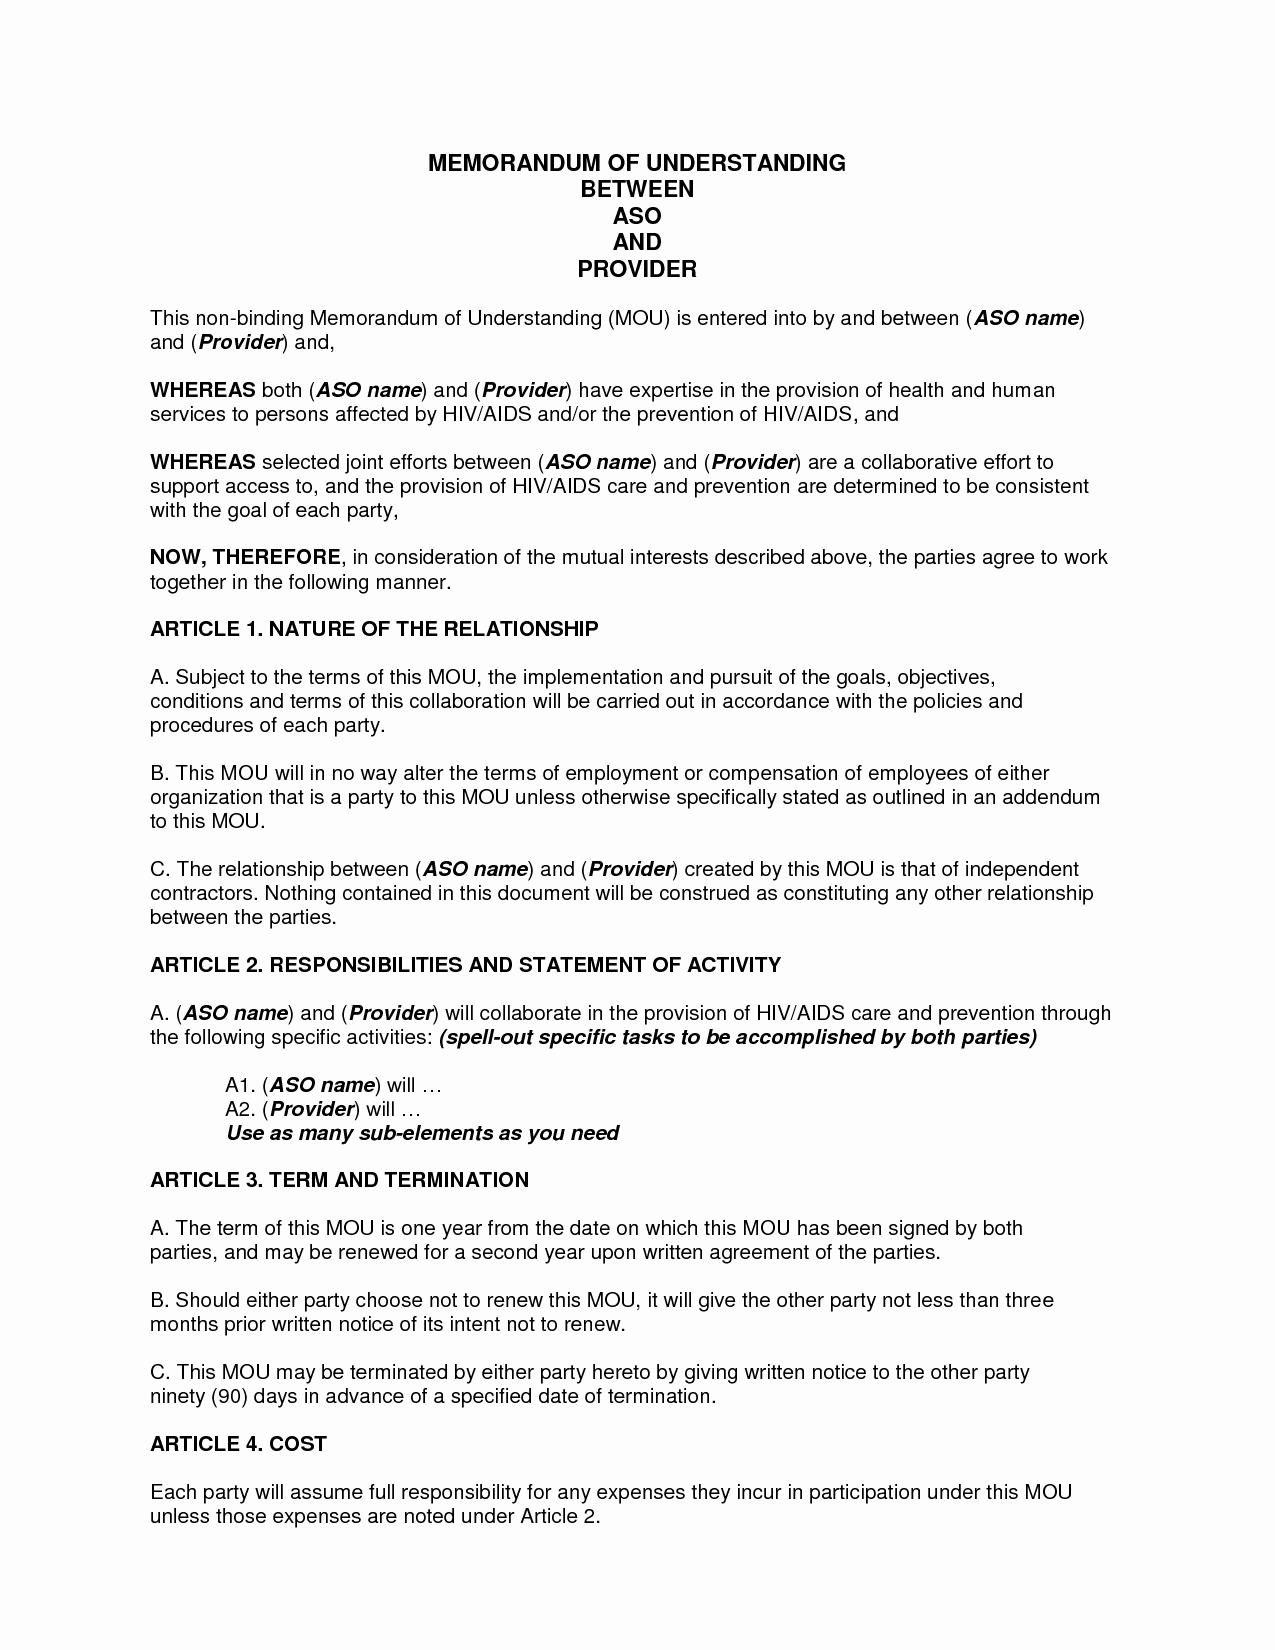 Memo Of Understanding Examples Lovely Sample Memorandum Of Understanding Business Partnership